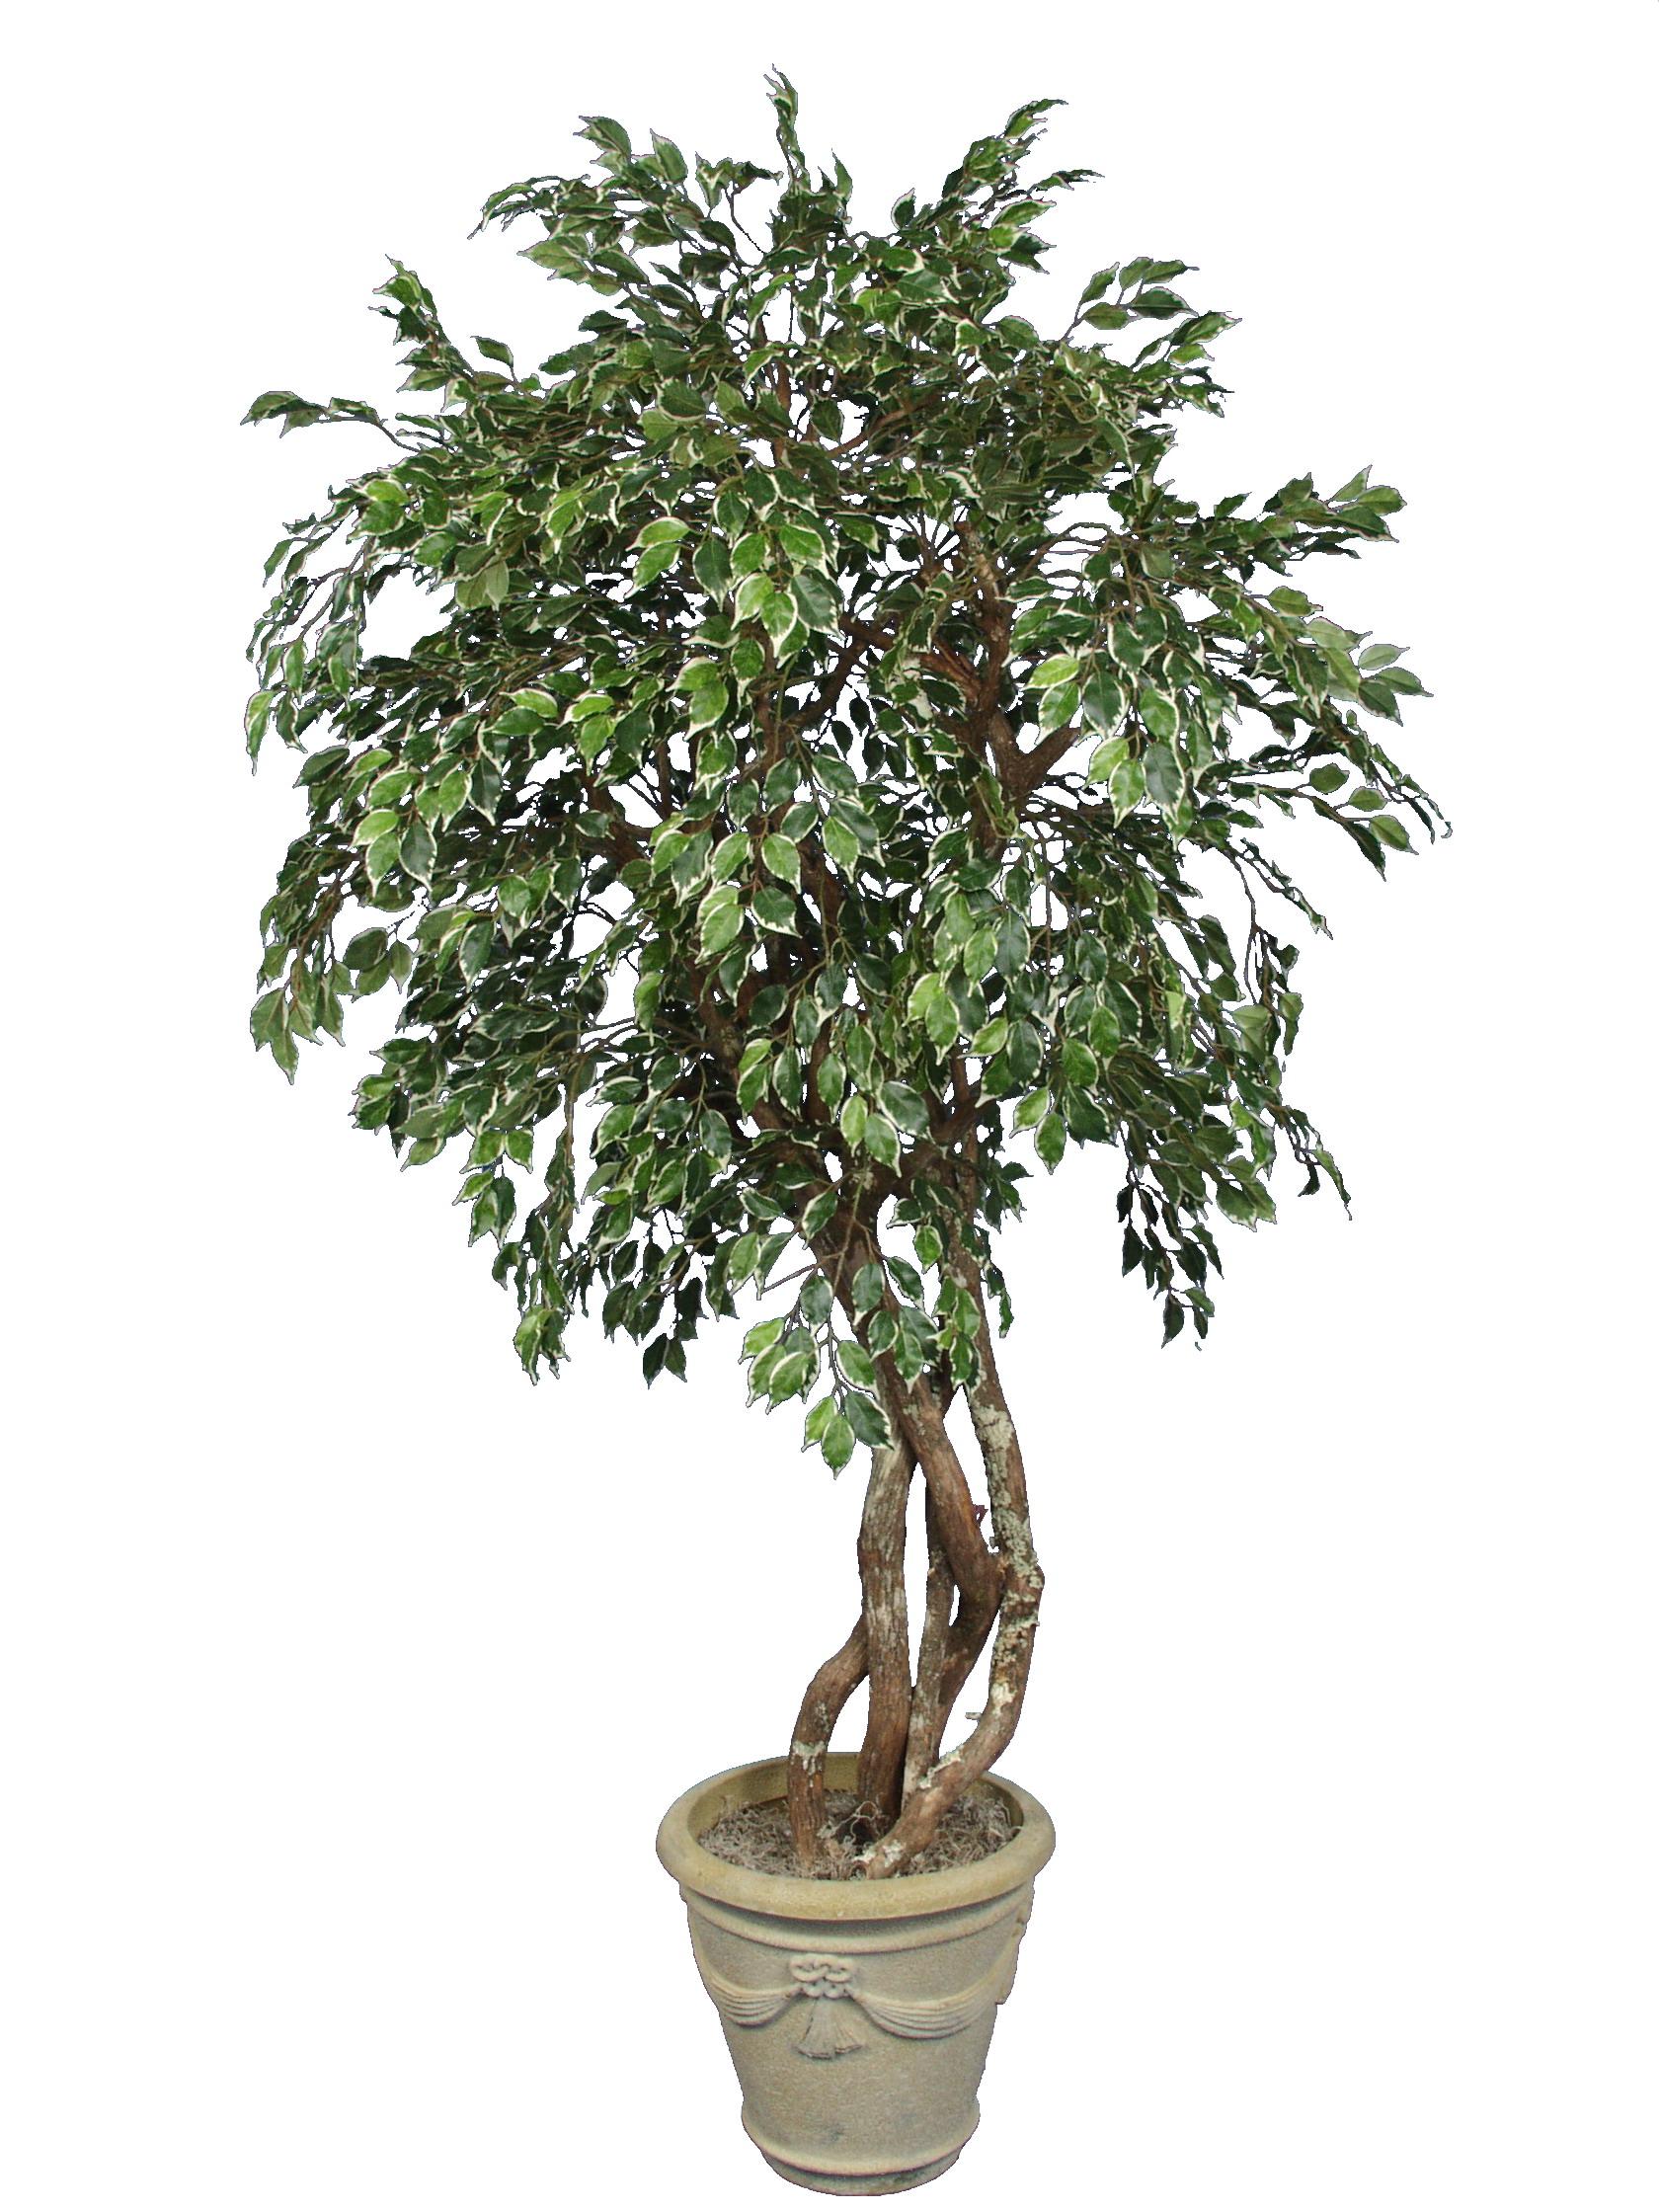 TRG 3939- Variegated Ficus